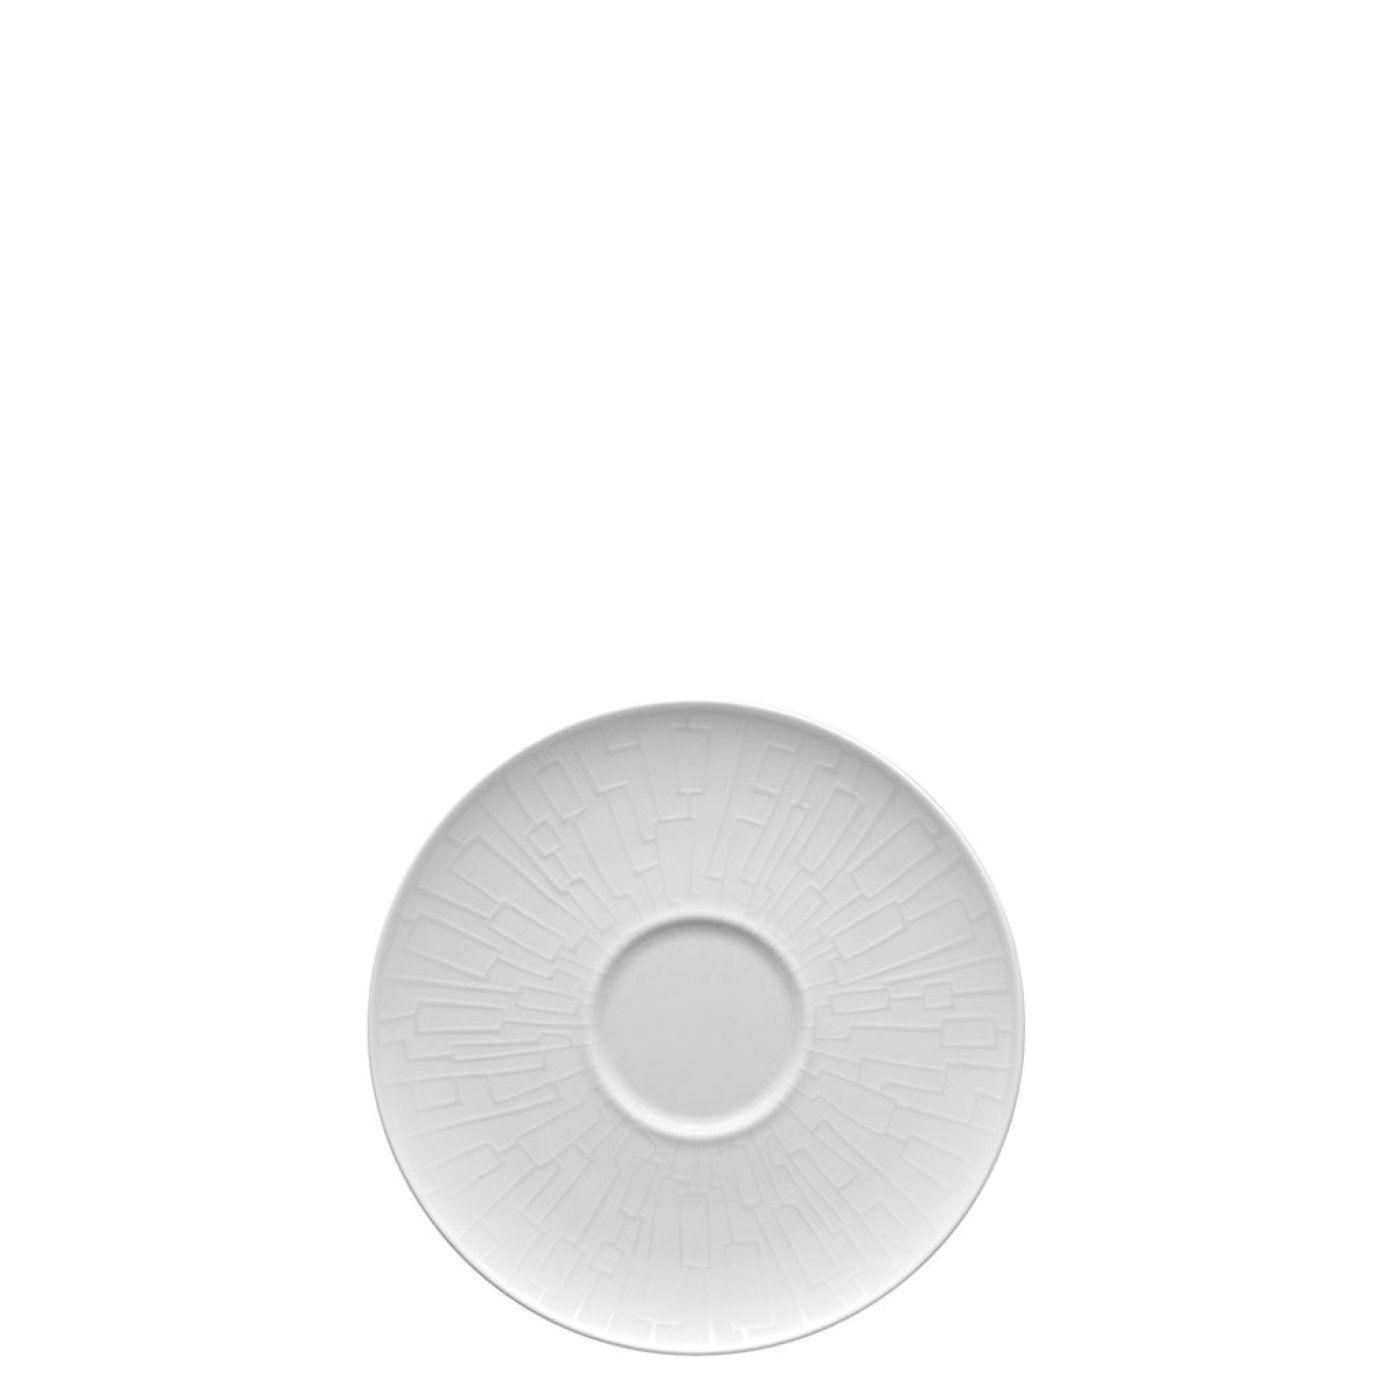 Studio-Line TAC Gropius Skin Silhouette Tee-/Kombi-Untertasse